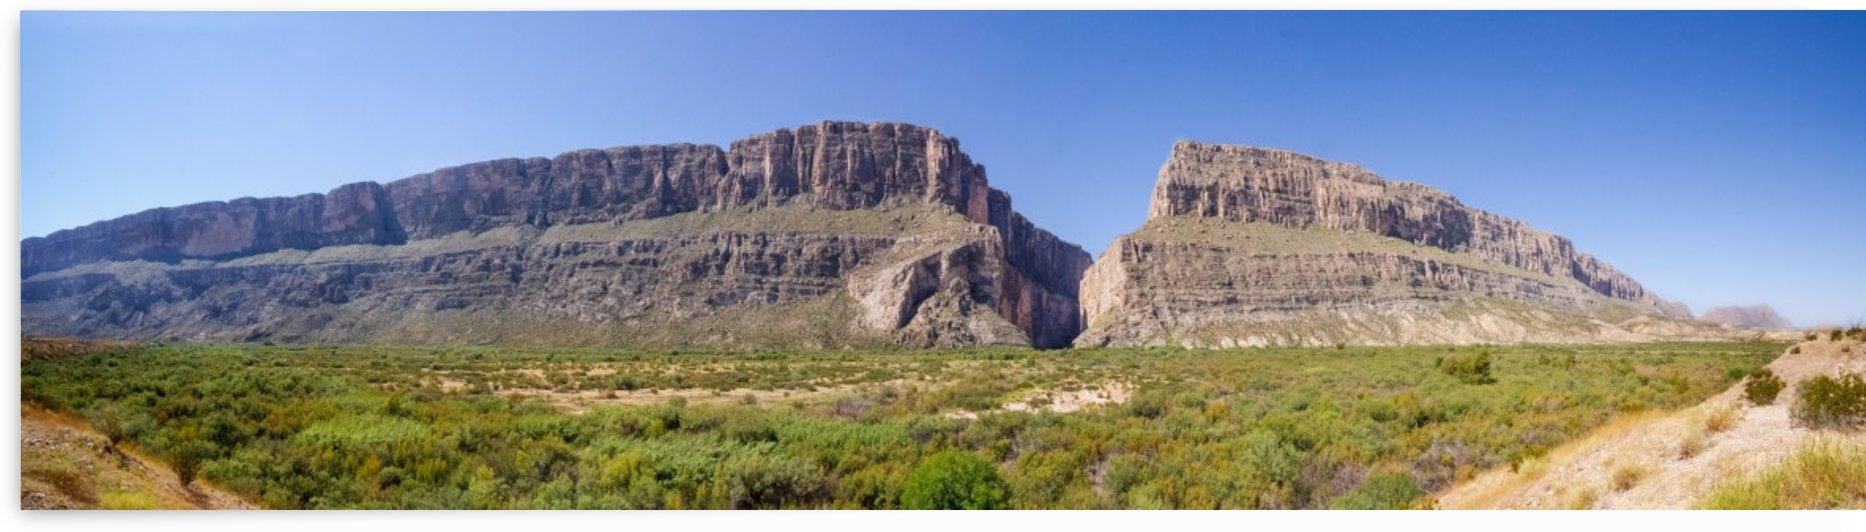 Santa Elena Canyon Pano by Wynne Mill Photography